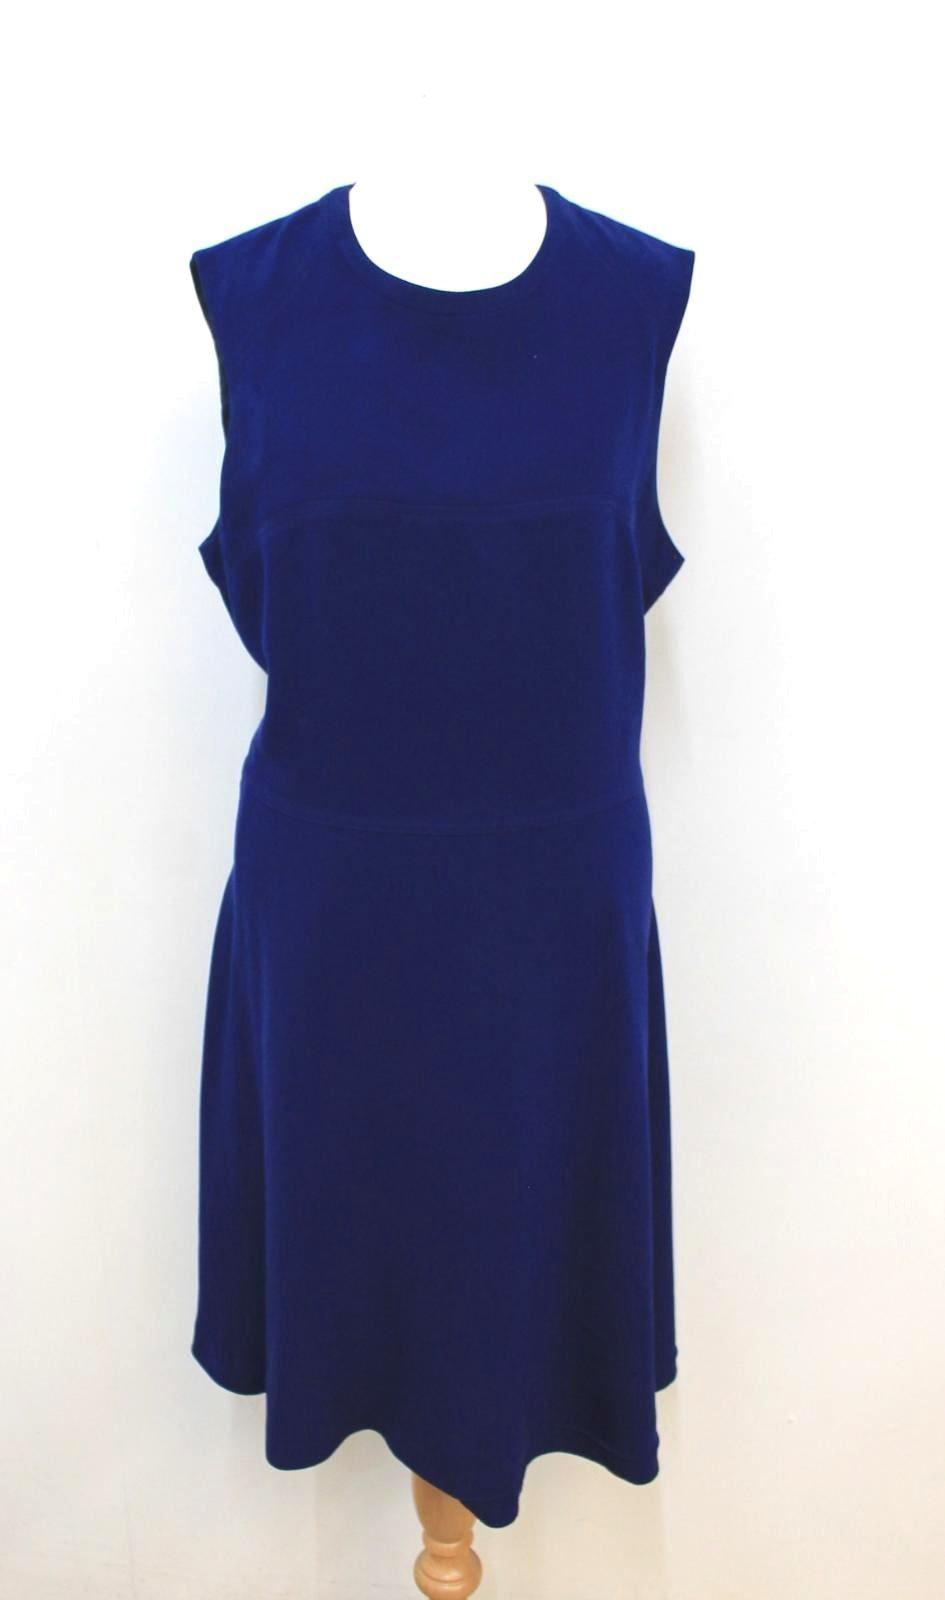 JOSEPH-Ladies-Navy-Blue-Sleeveless-Crew-Neck-Midi-Shift-Dress-Size-EU42-UK14